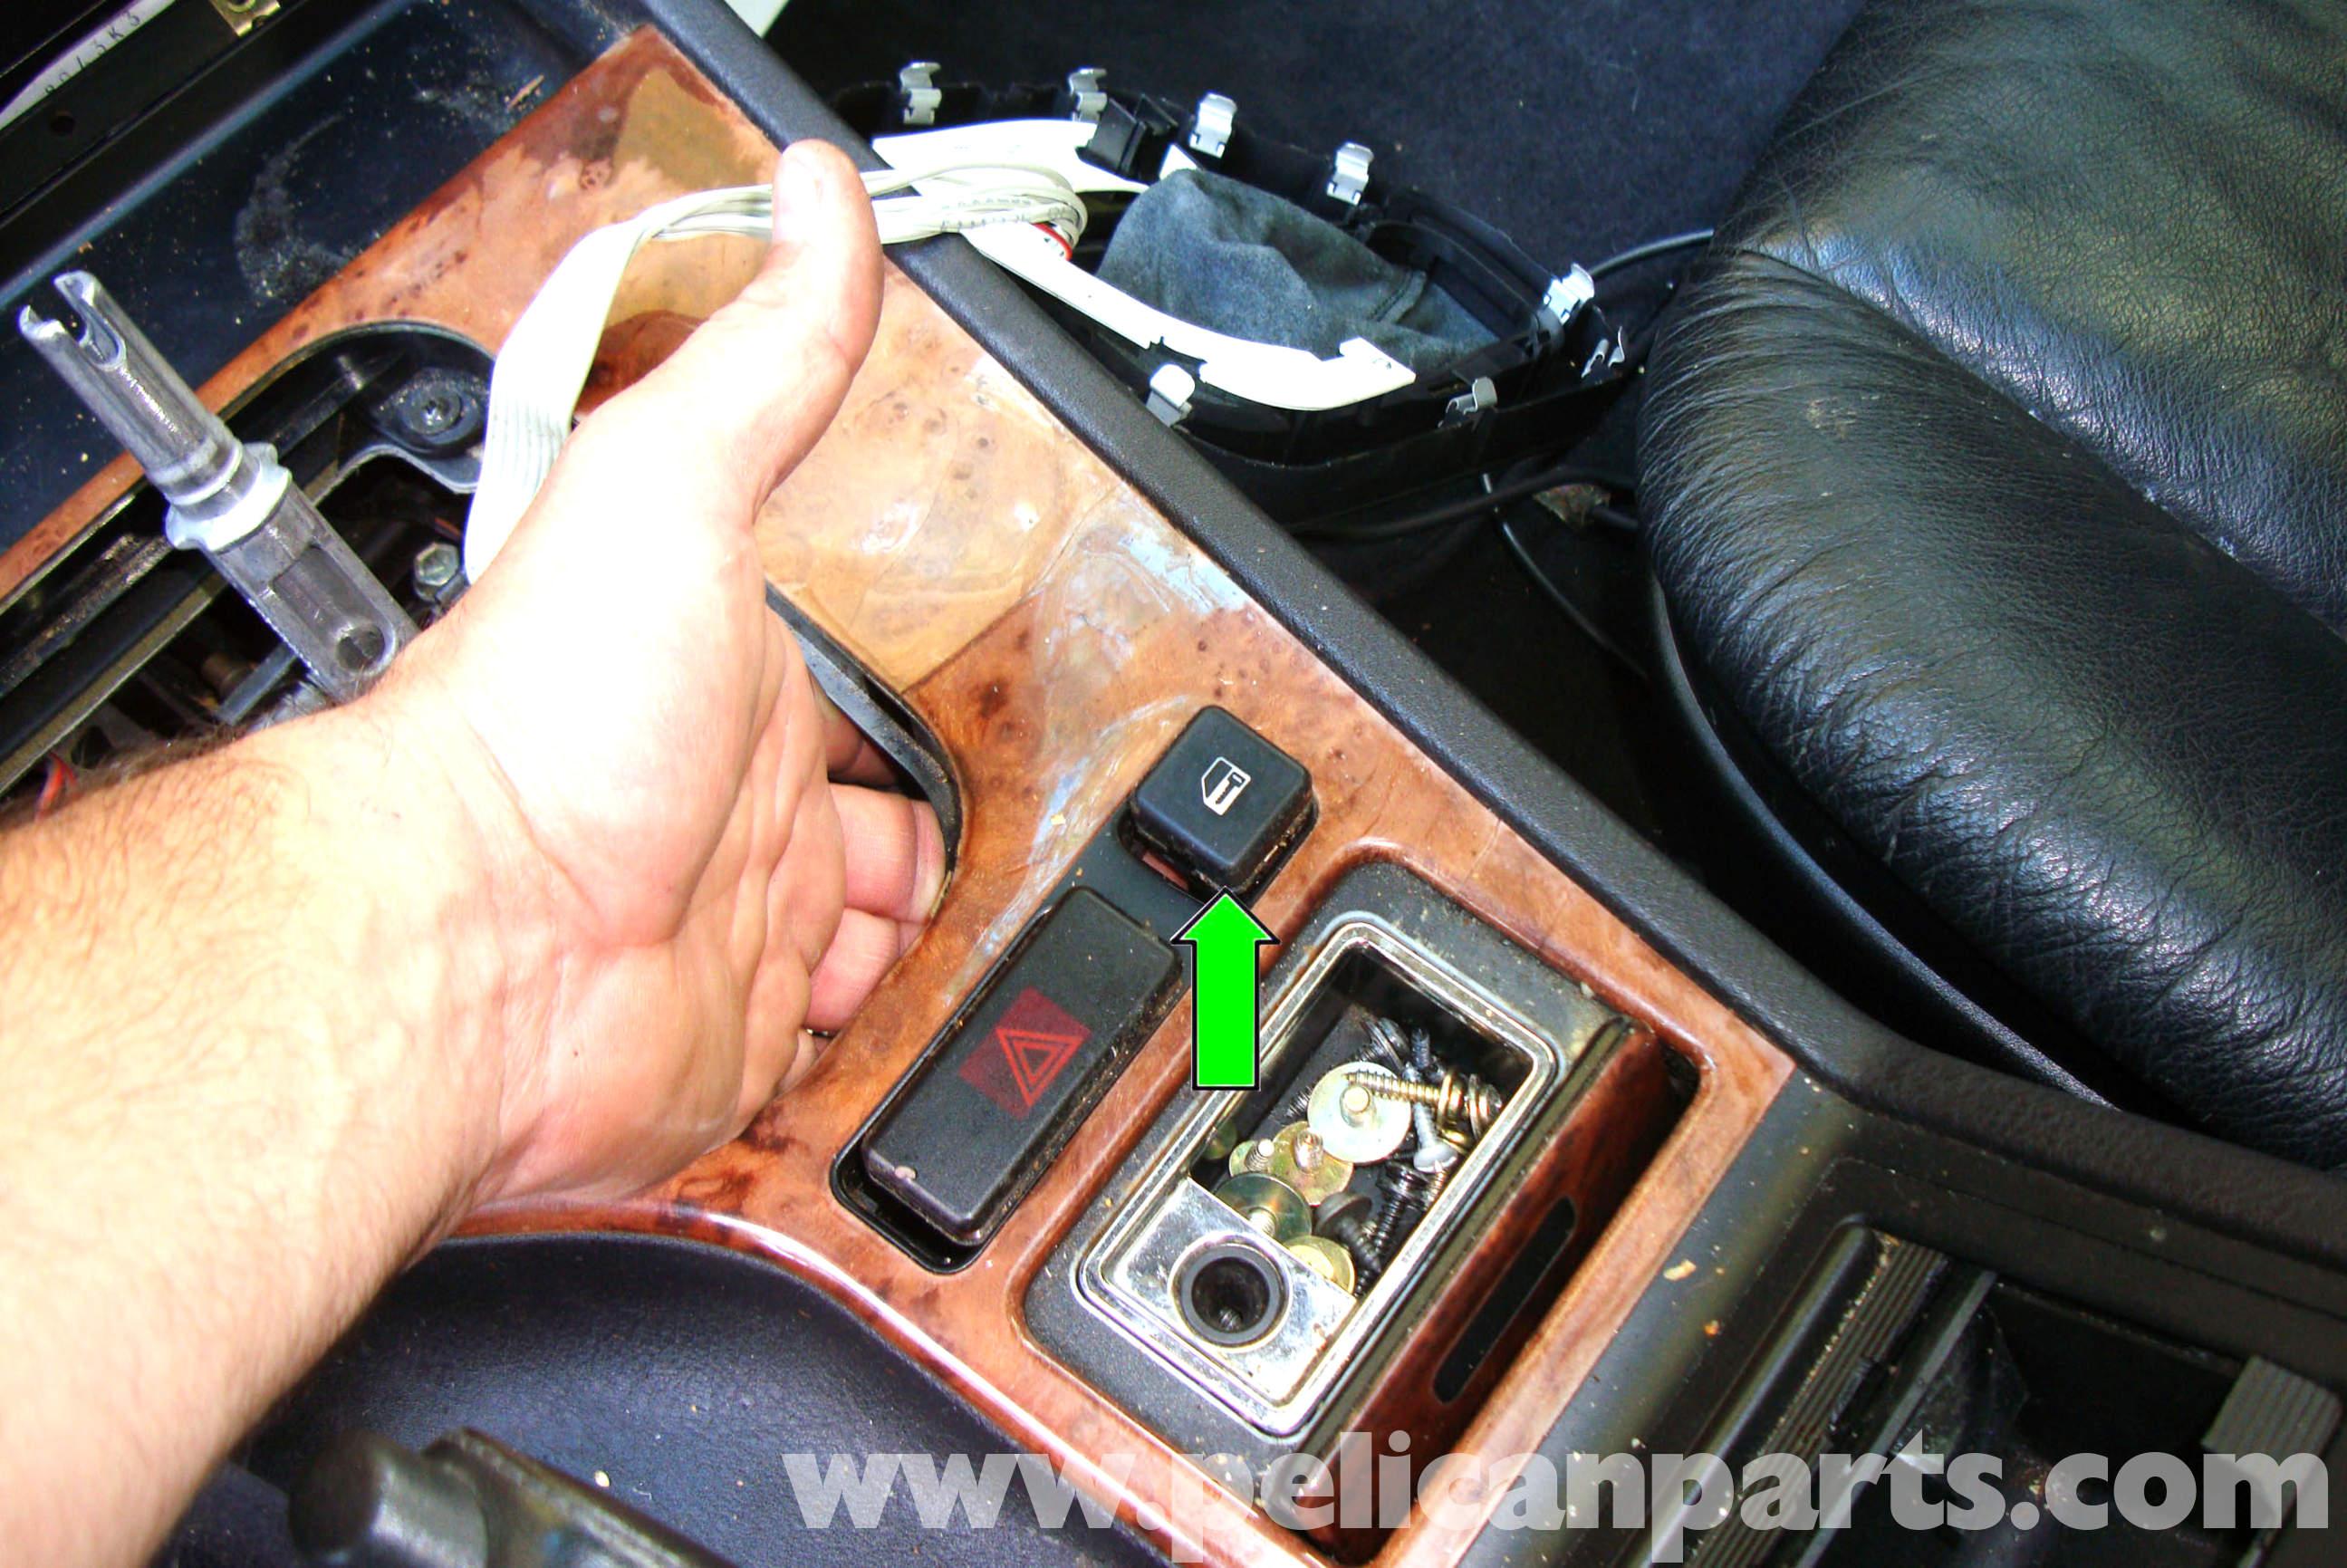 pic06 bmw e39 5 series center console removal 1997 2003 525i, 528i, 530i